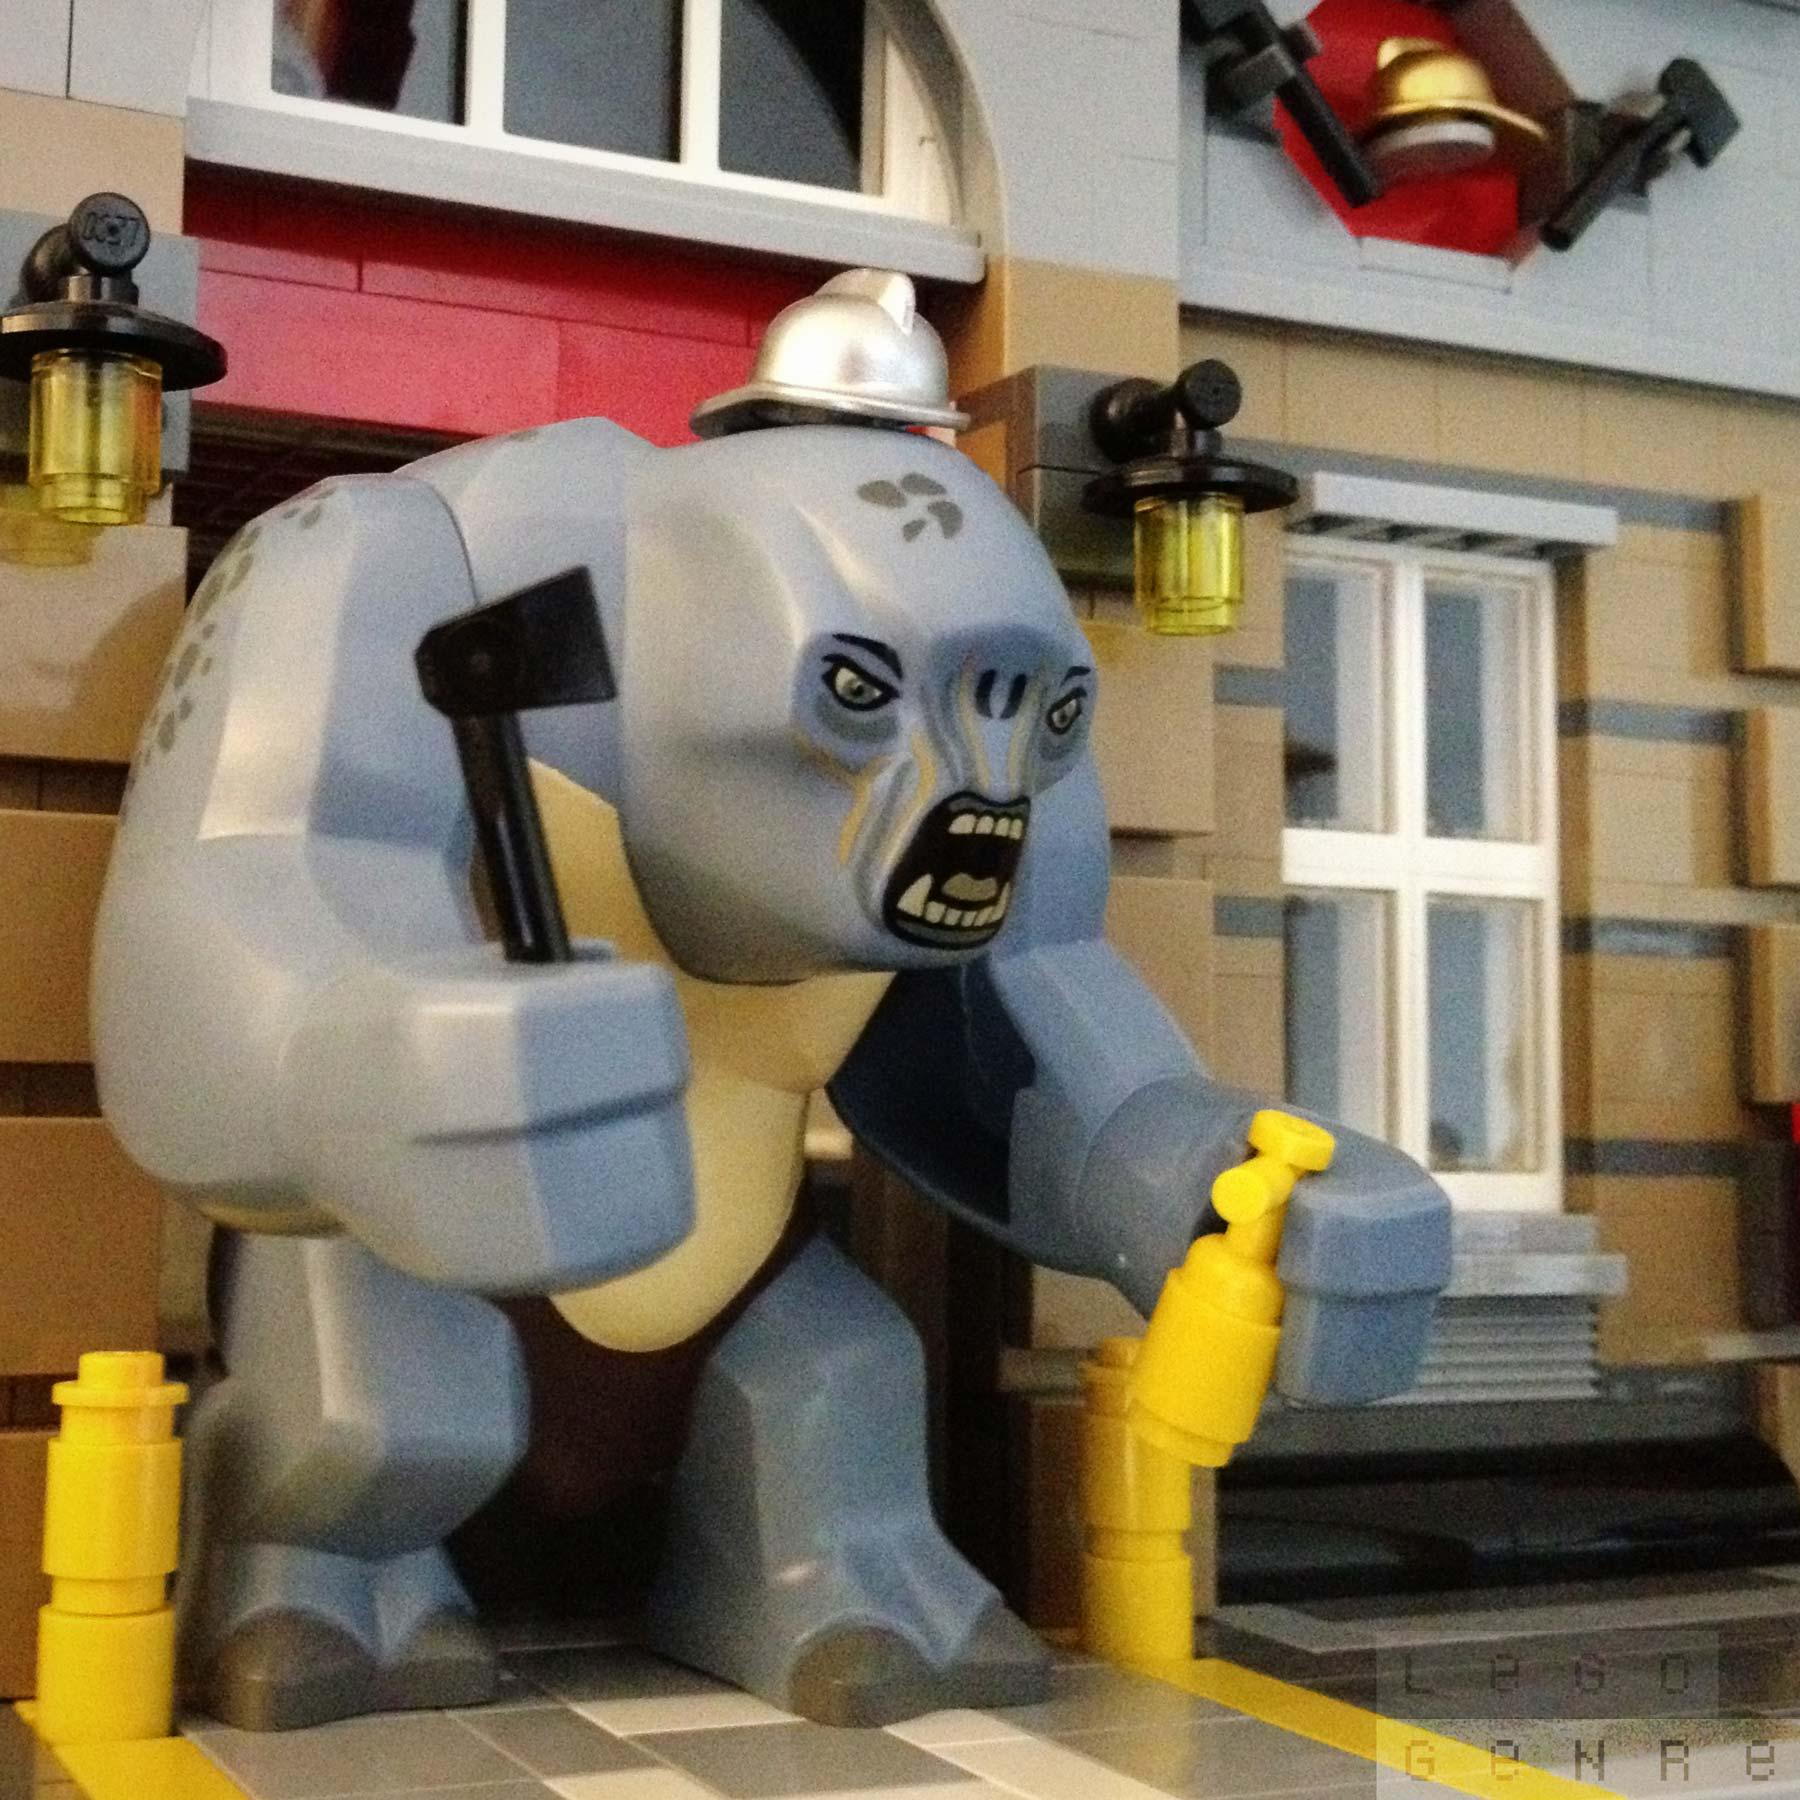 LegoGenre 00293: Firefighter Bert